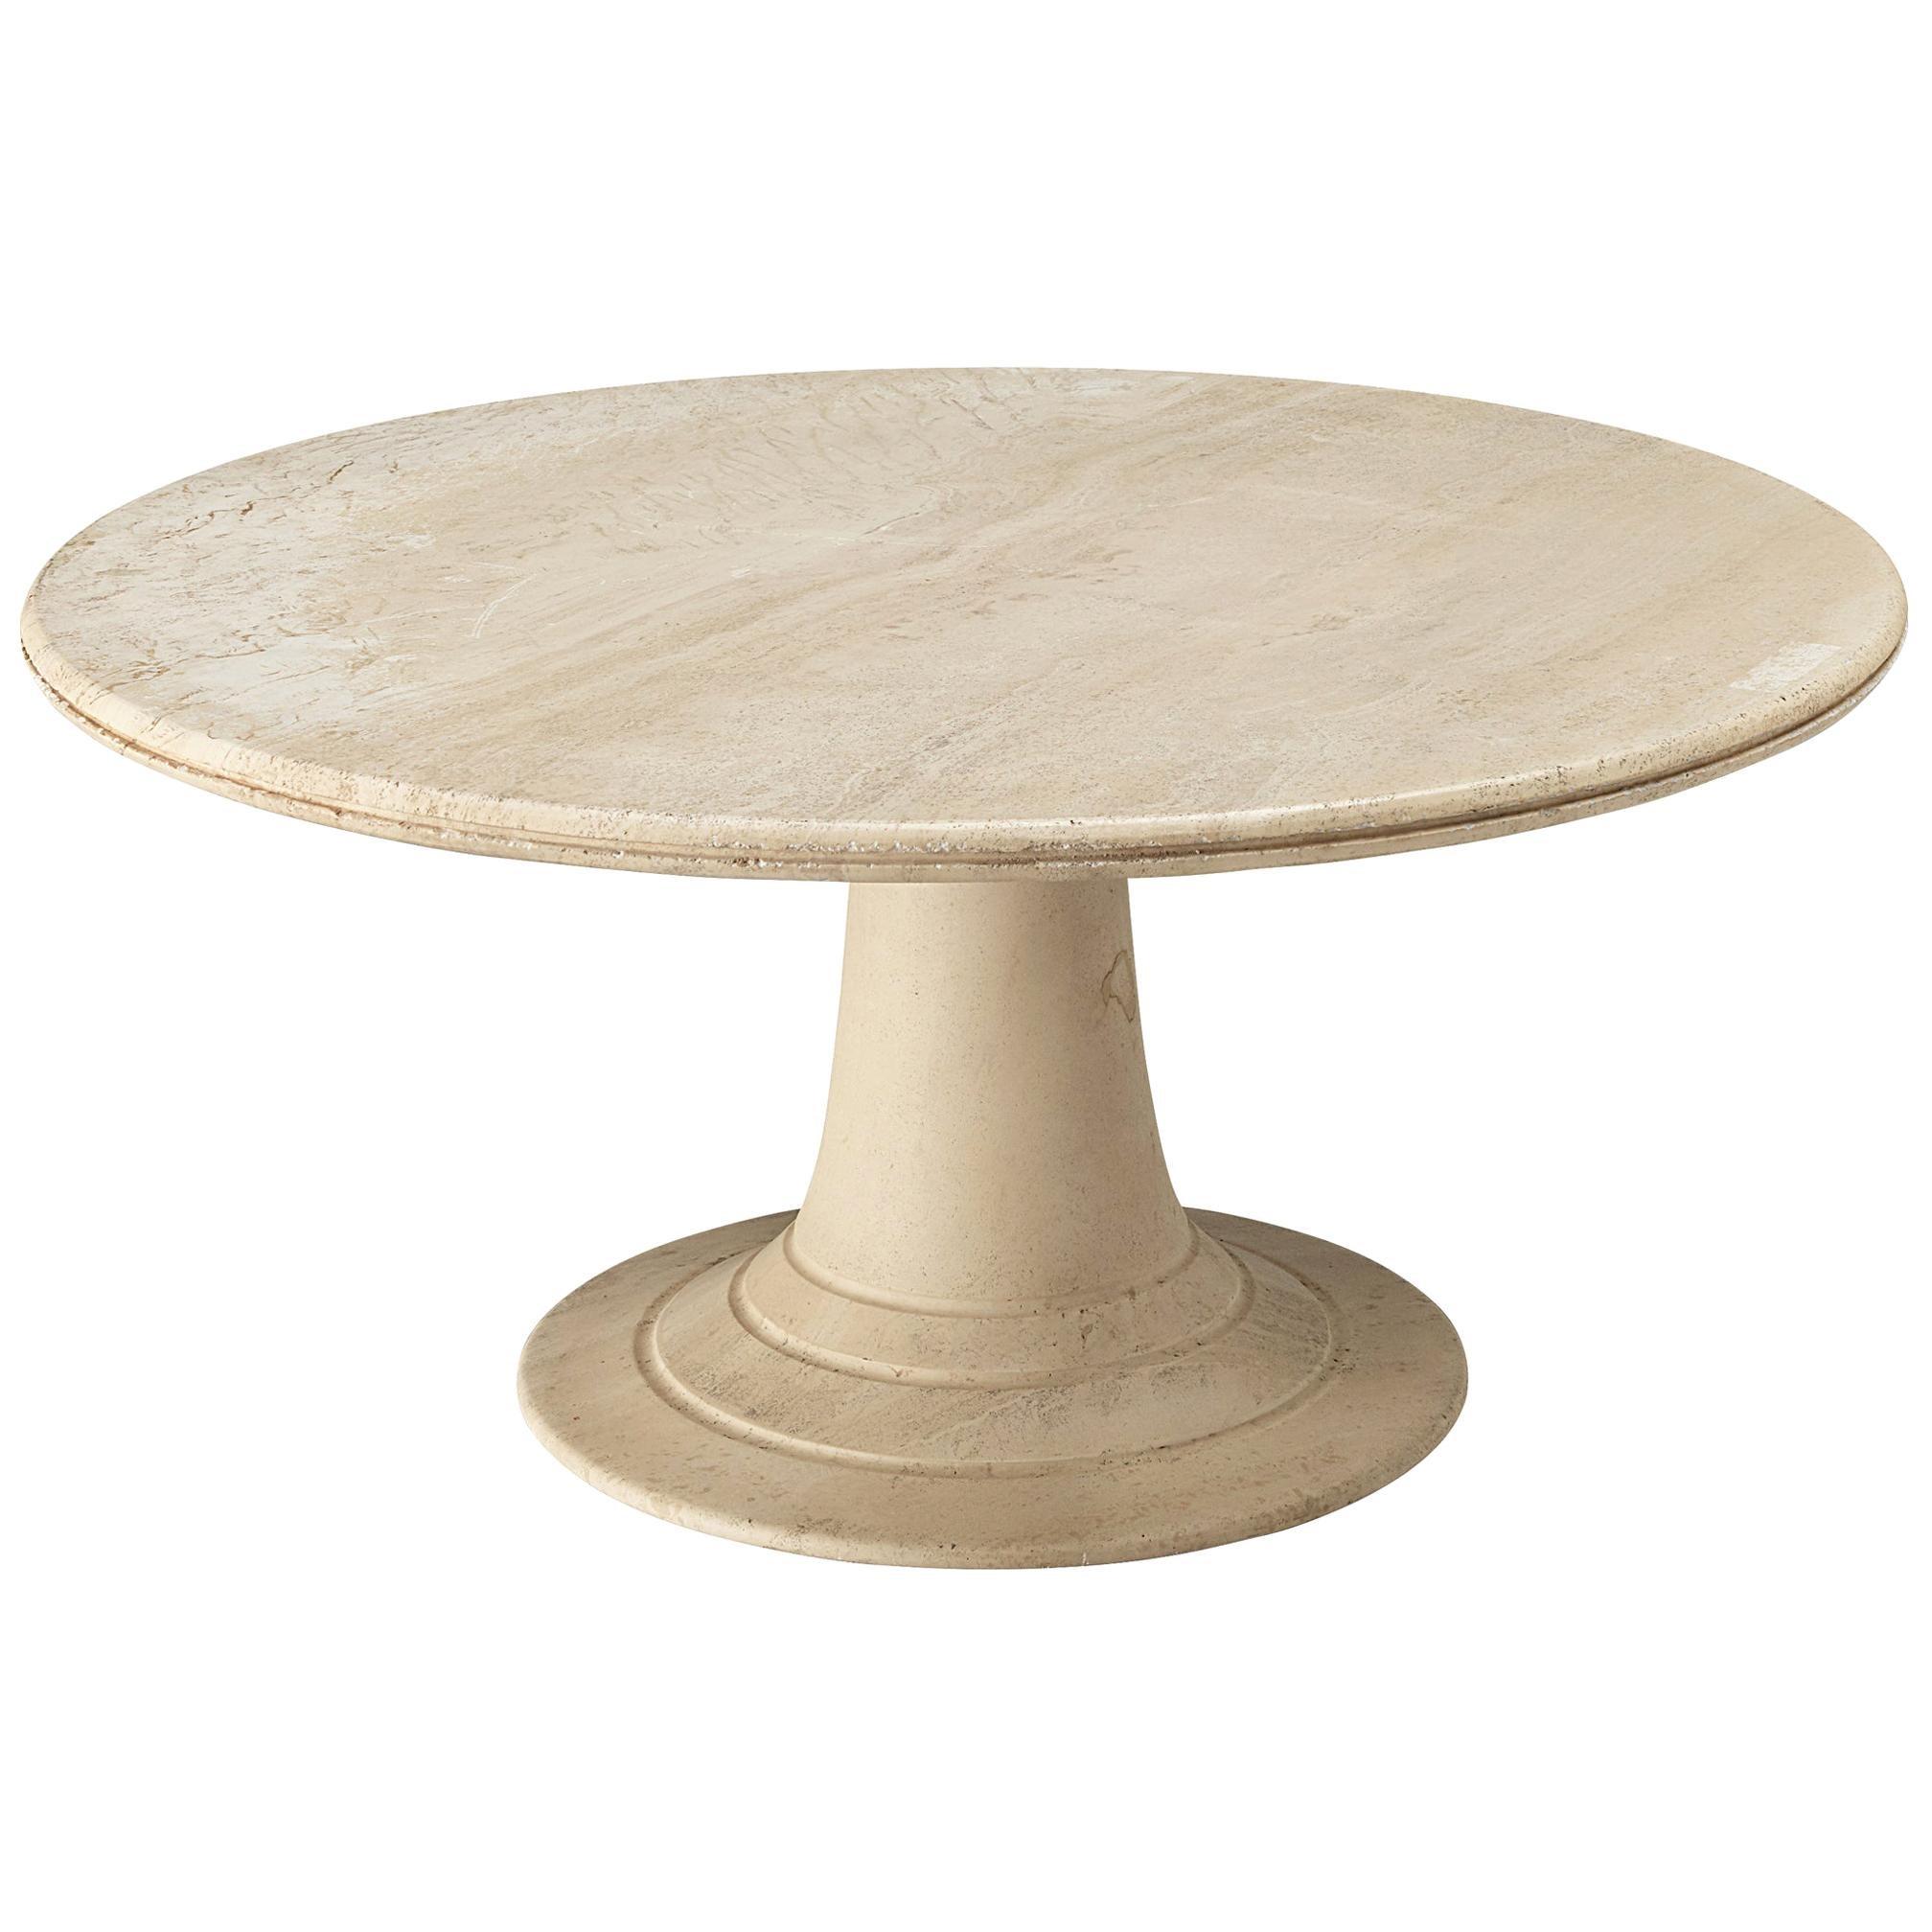 Round Pedestal Coffee Table in Travertine